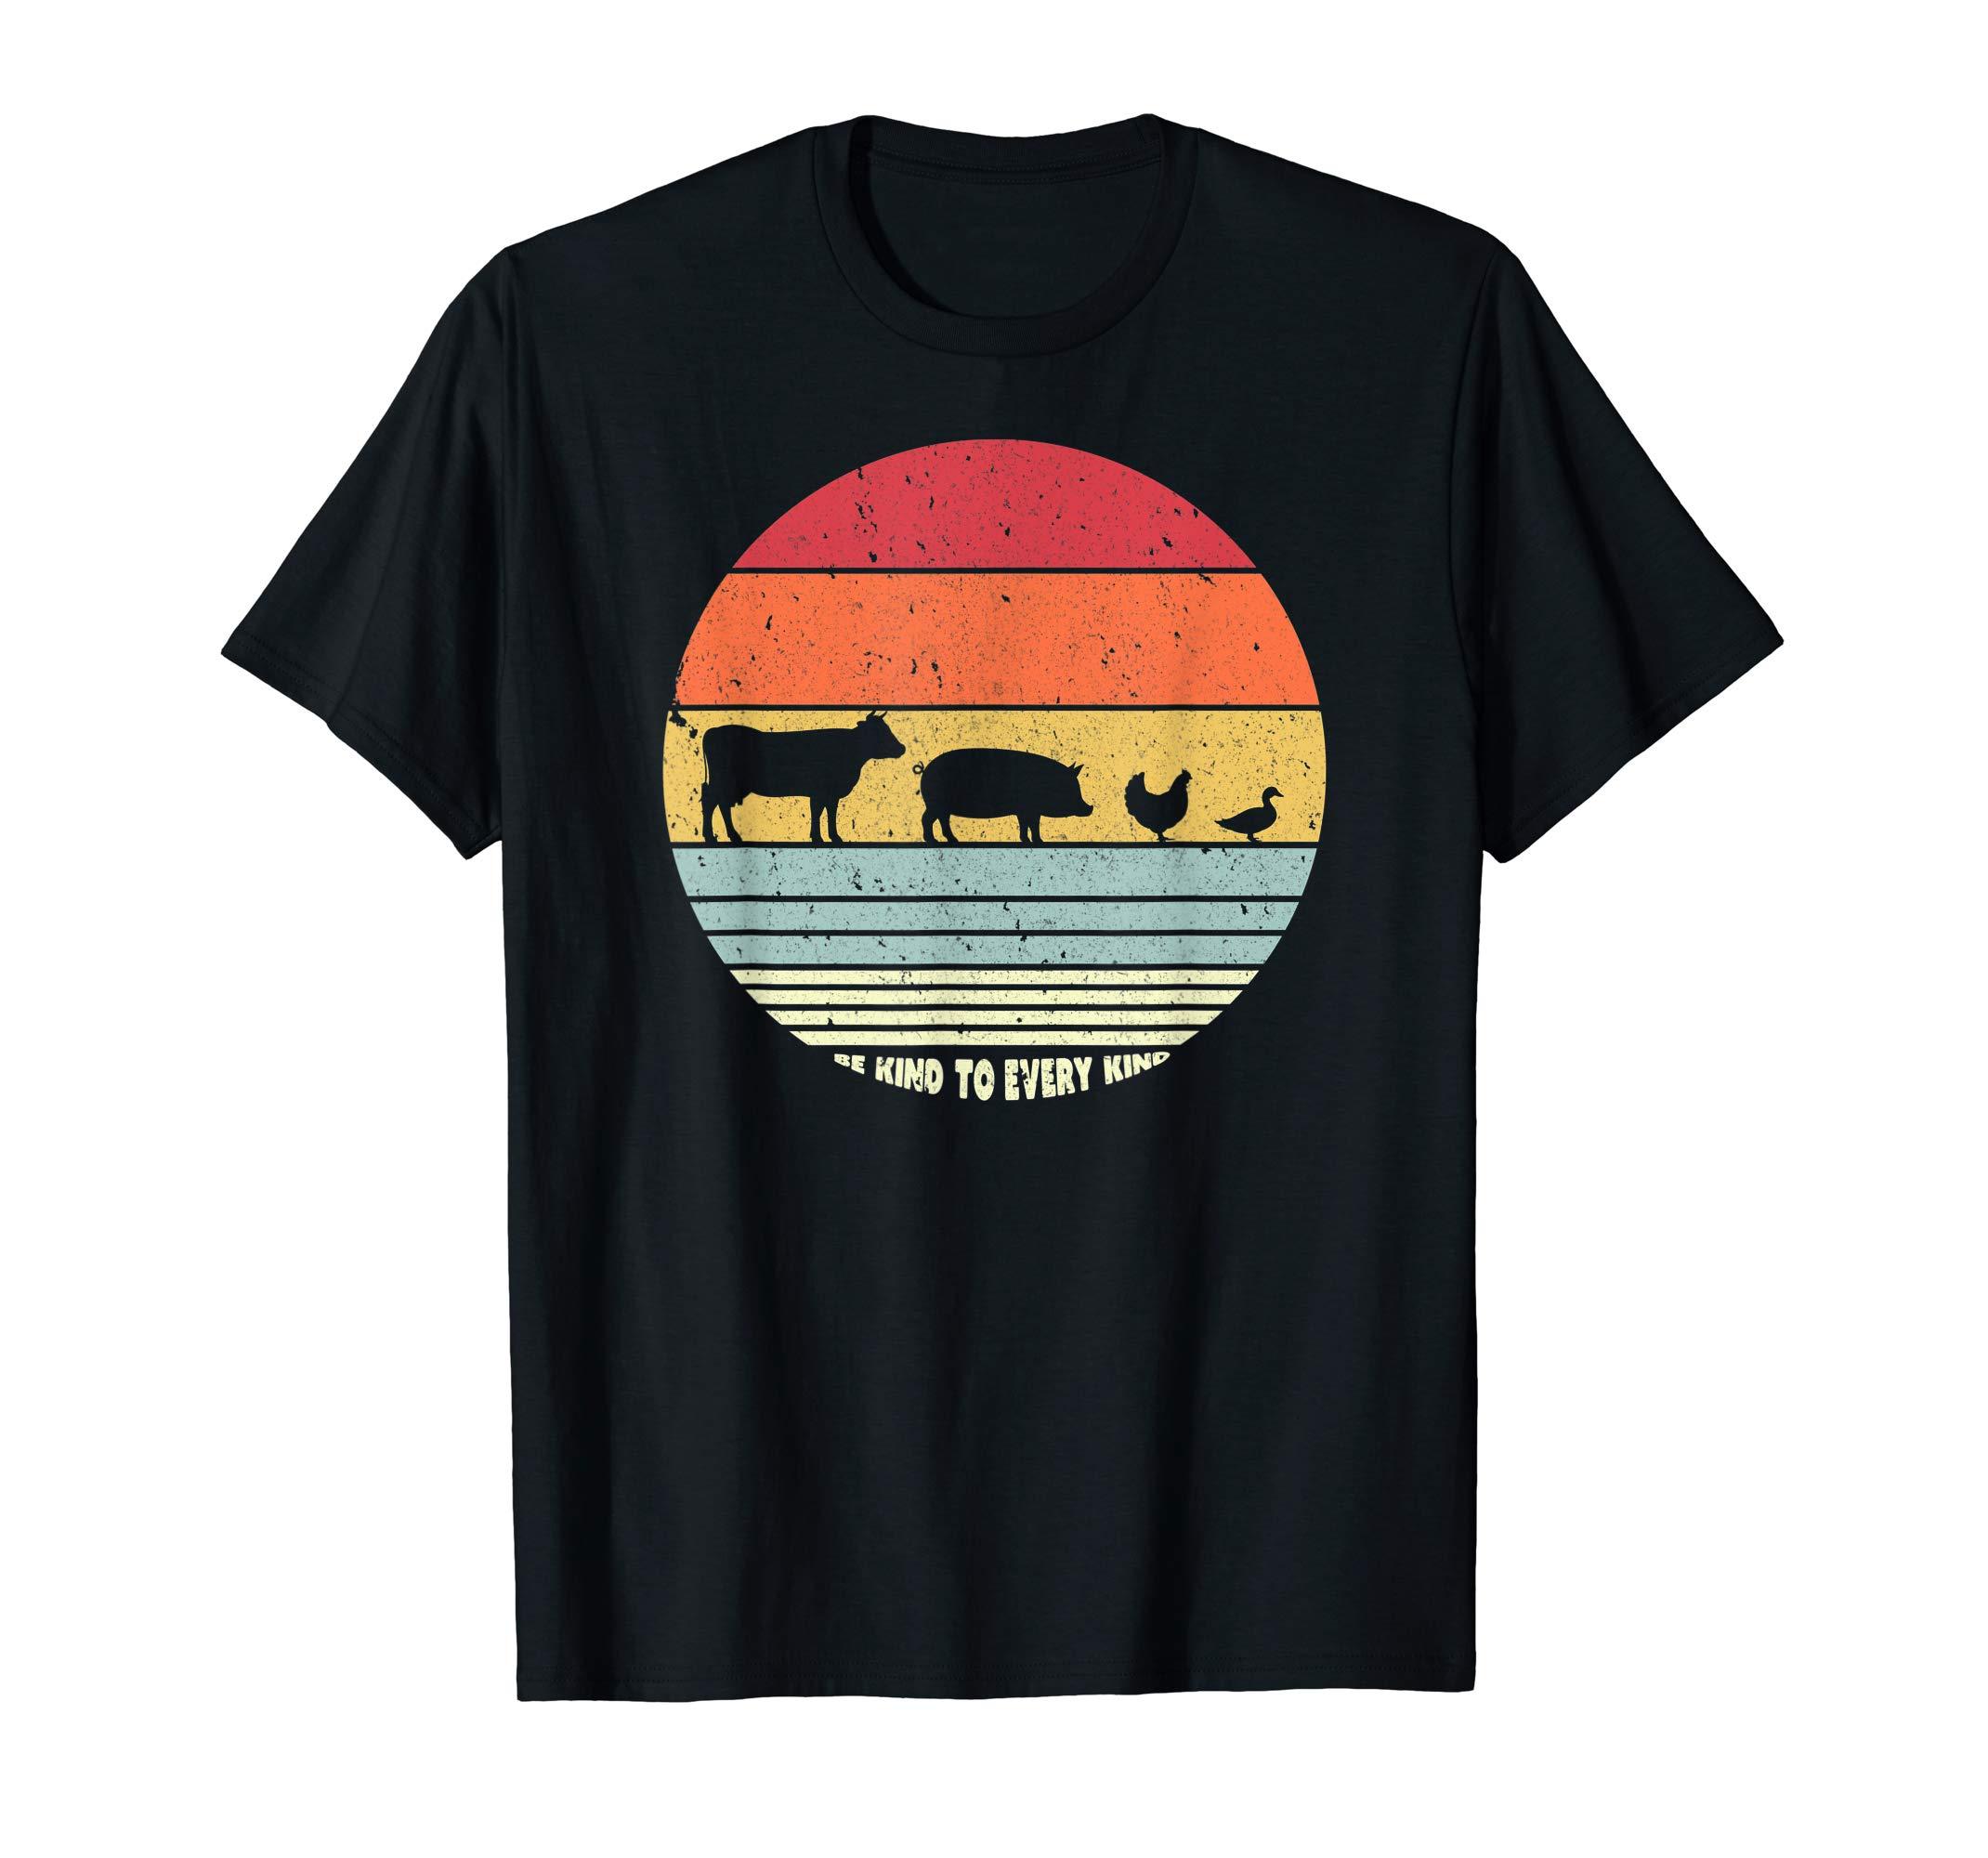 vegan-gifts-t-shirt